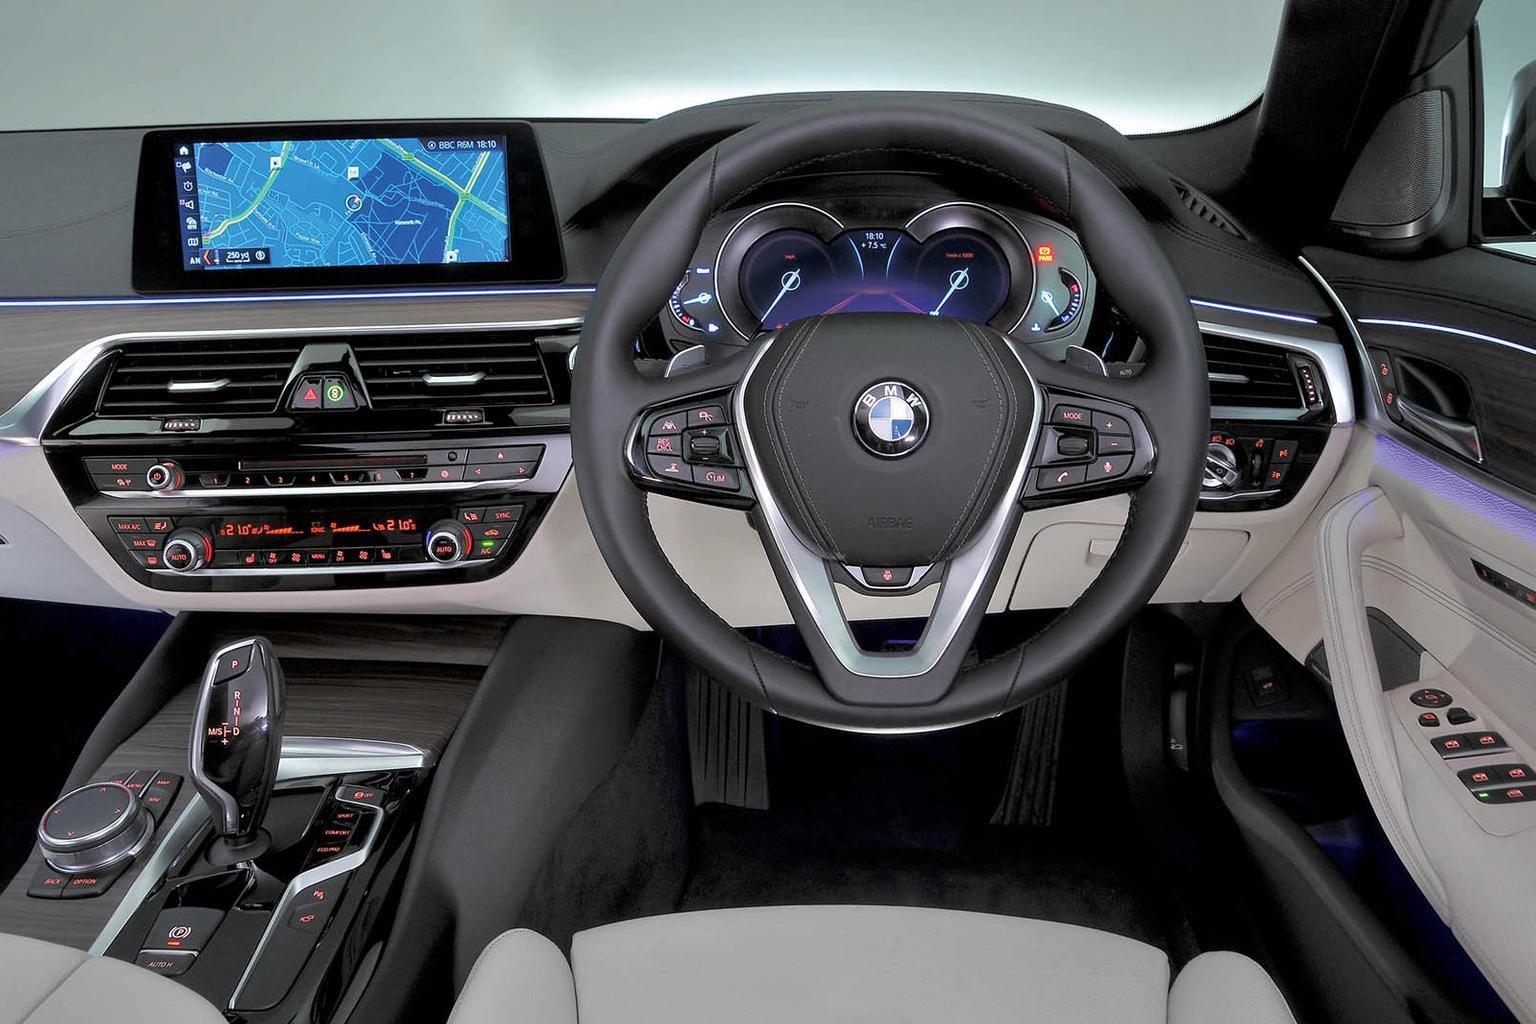 BMW 5 Series Interior, Sat Nav, Dashboard | What Car?